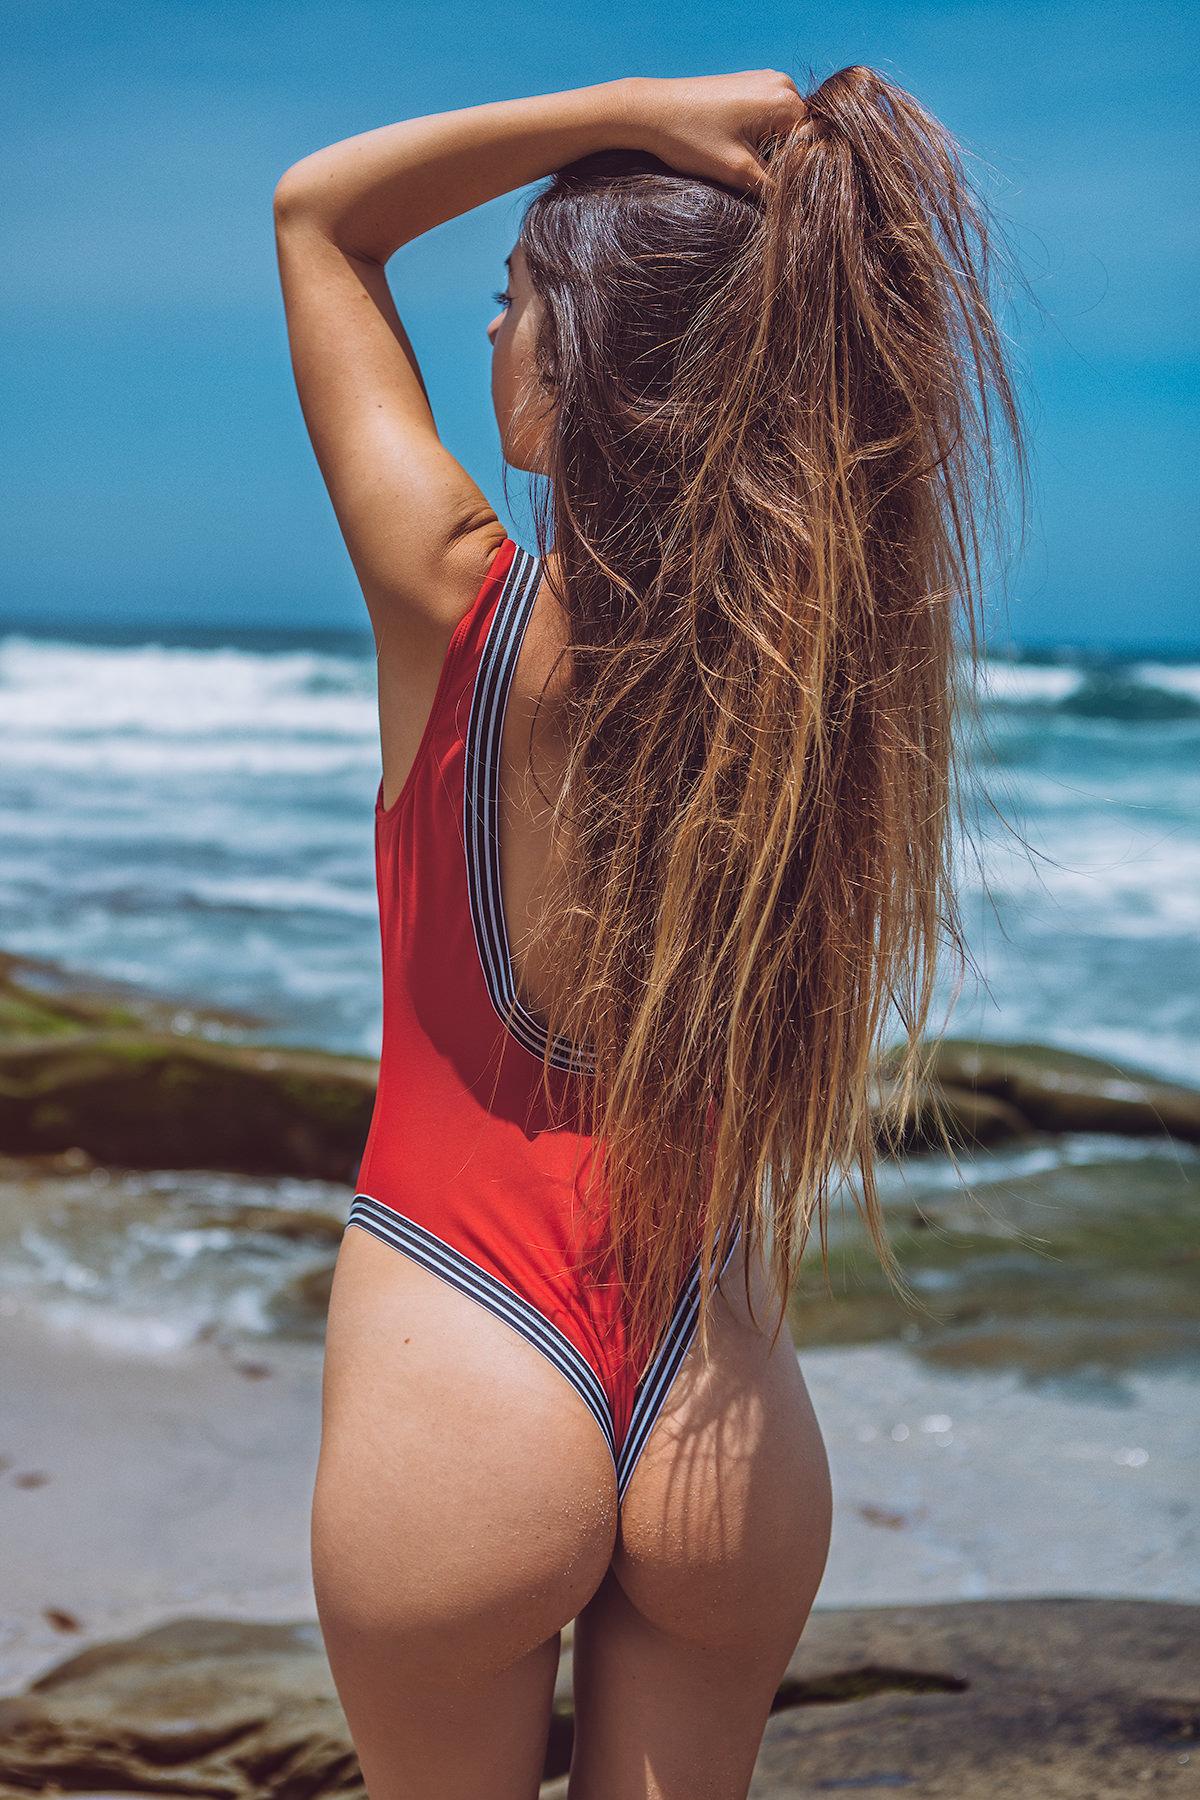 america bikini casey lorz